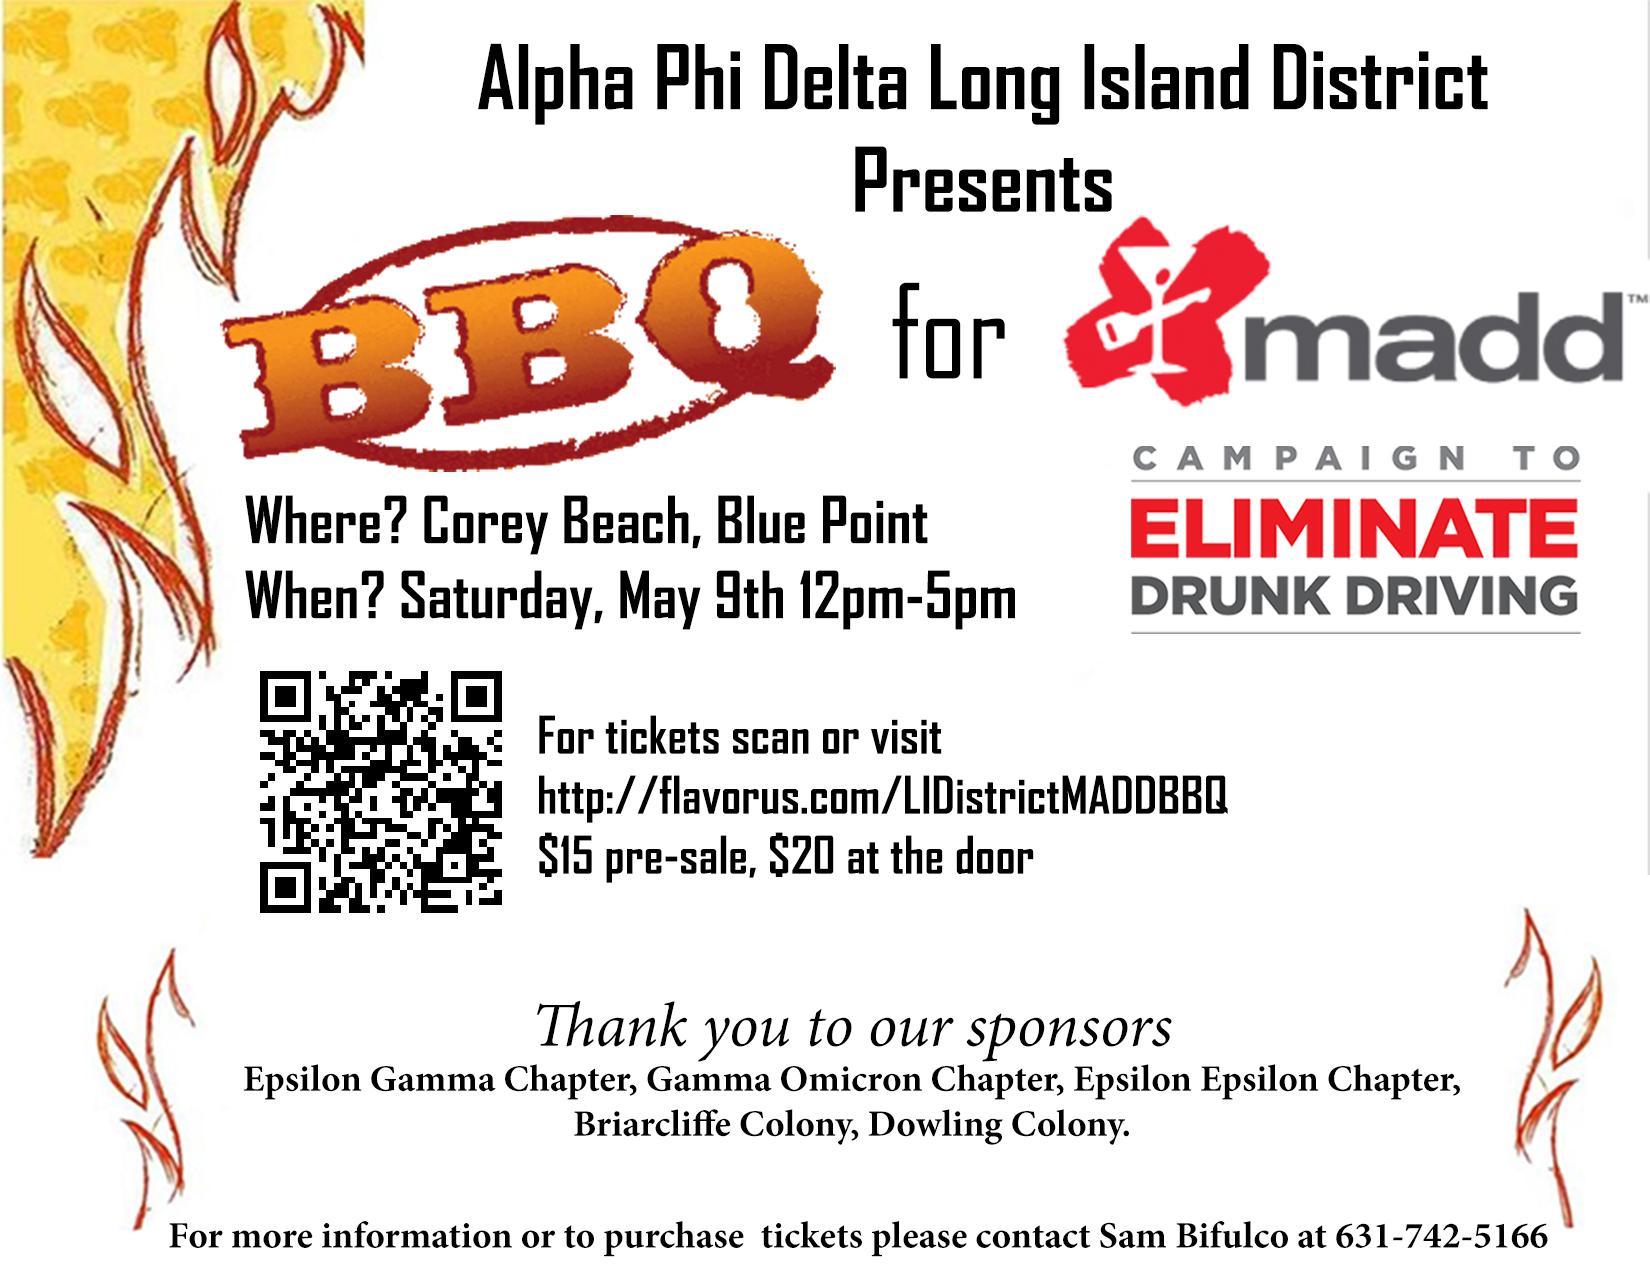 Directions To Corey Beach Long Island